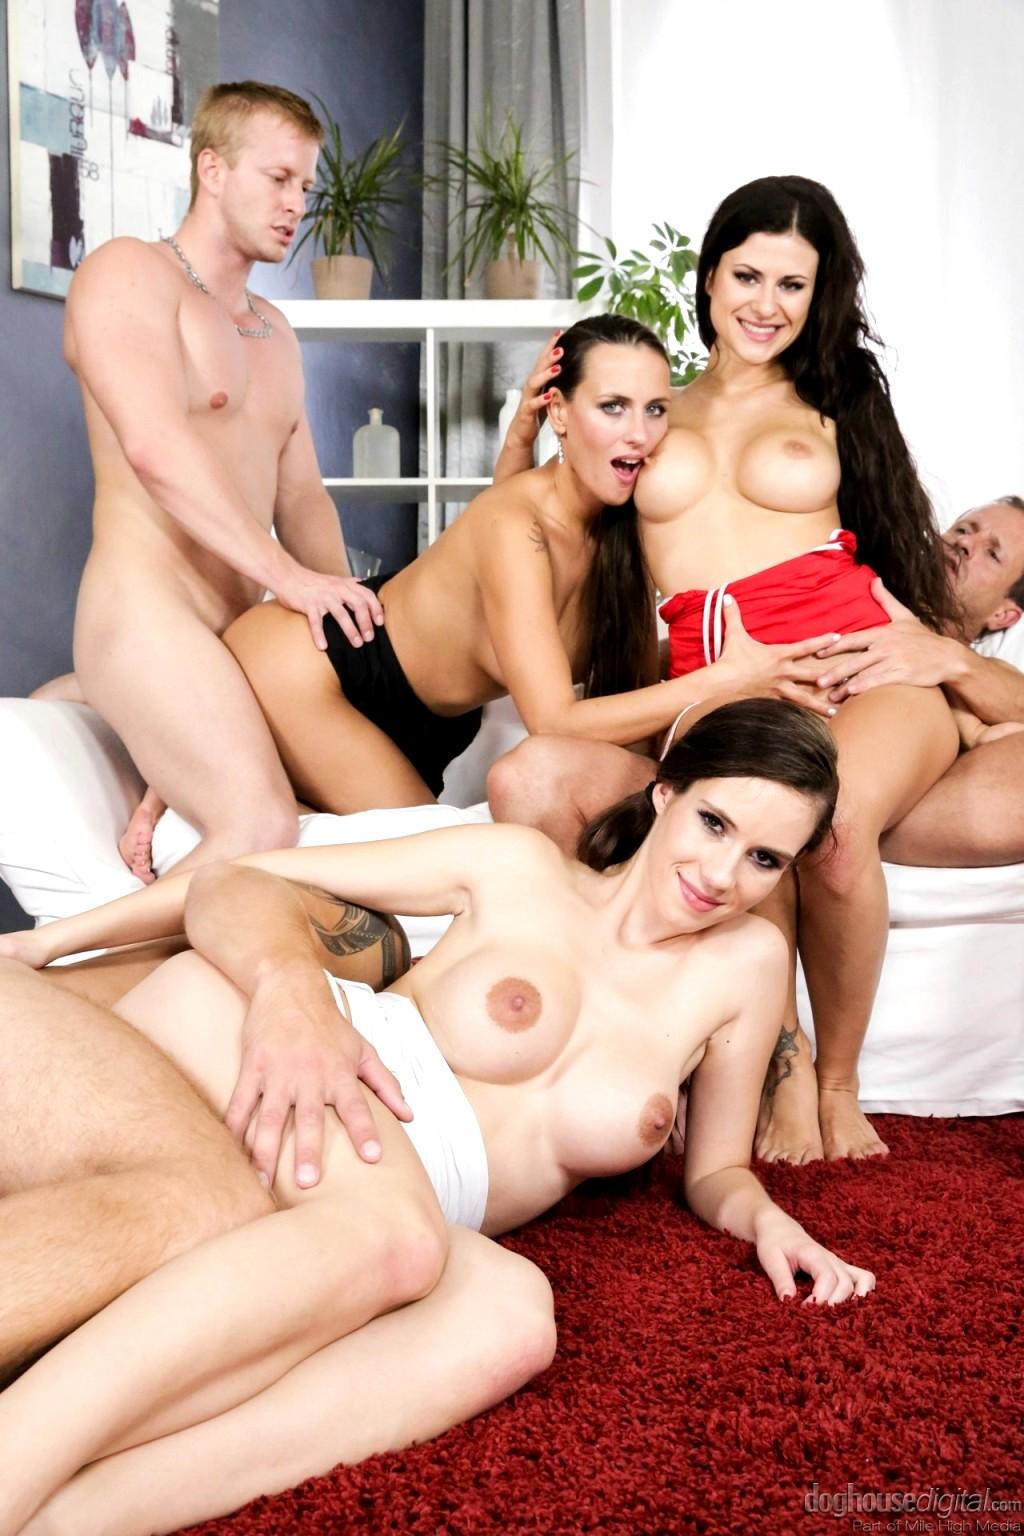 The mineverse mini orgy